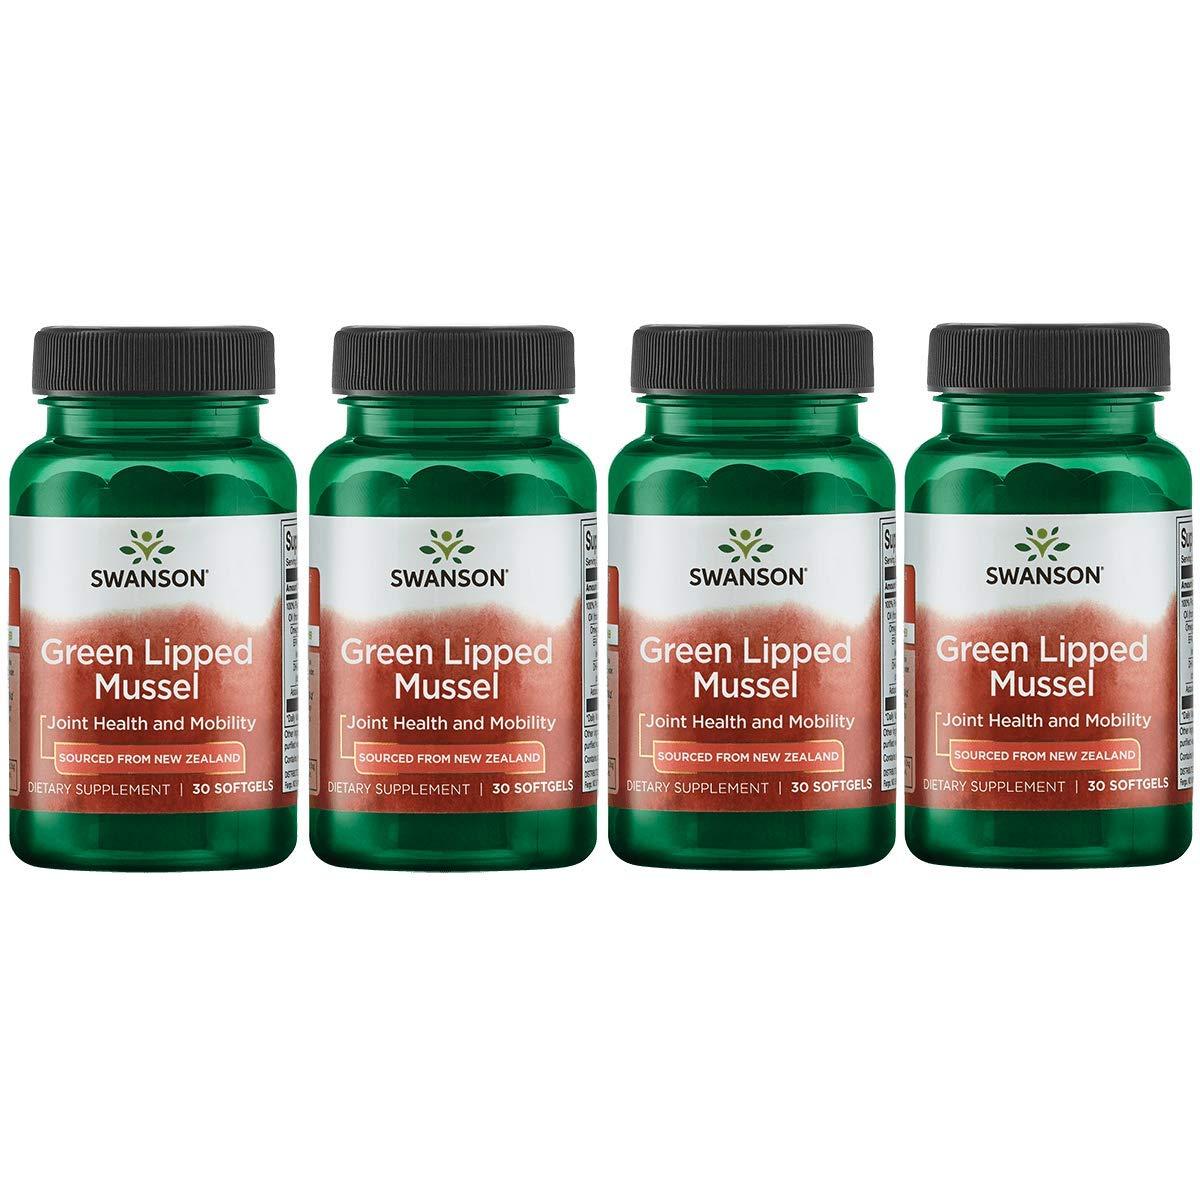 Swanson New Zealand Green Lipped Mussel Oil 30